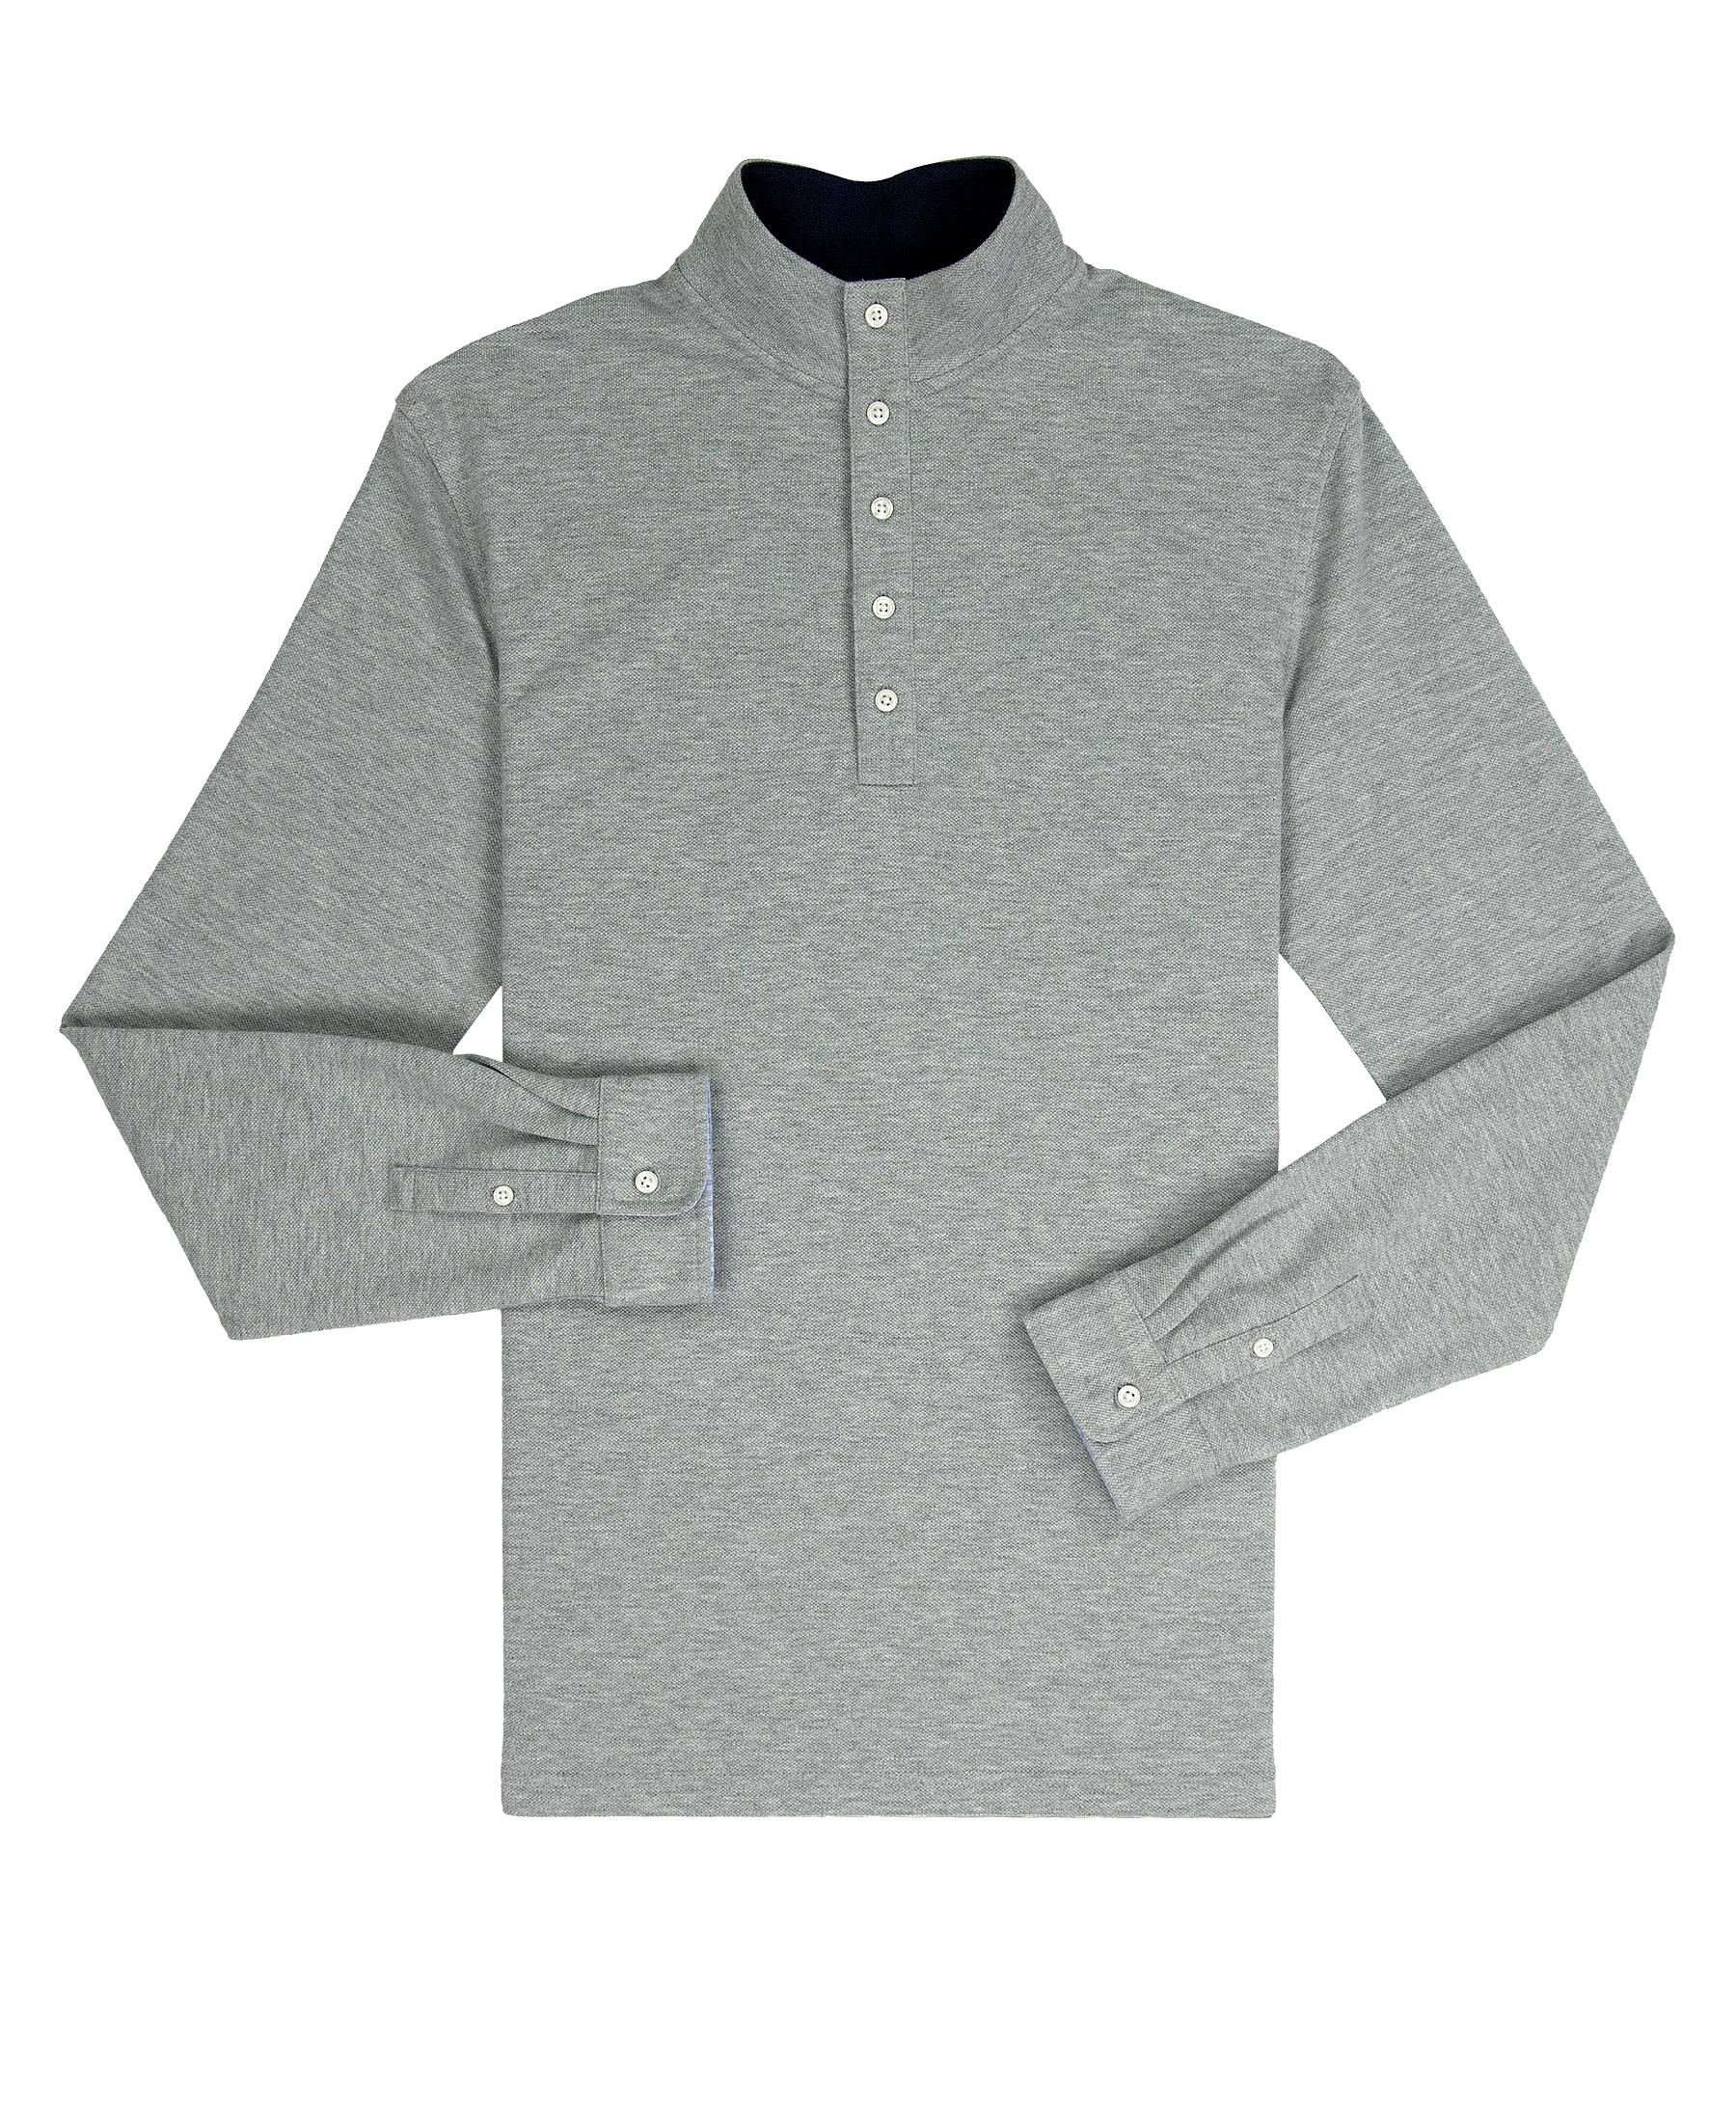 Mock Collar Pullover - Heather Grey Comfort Pique